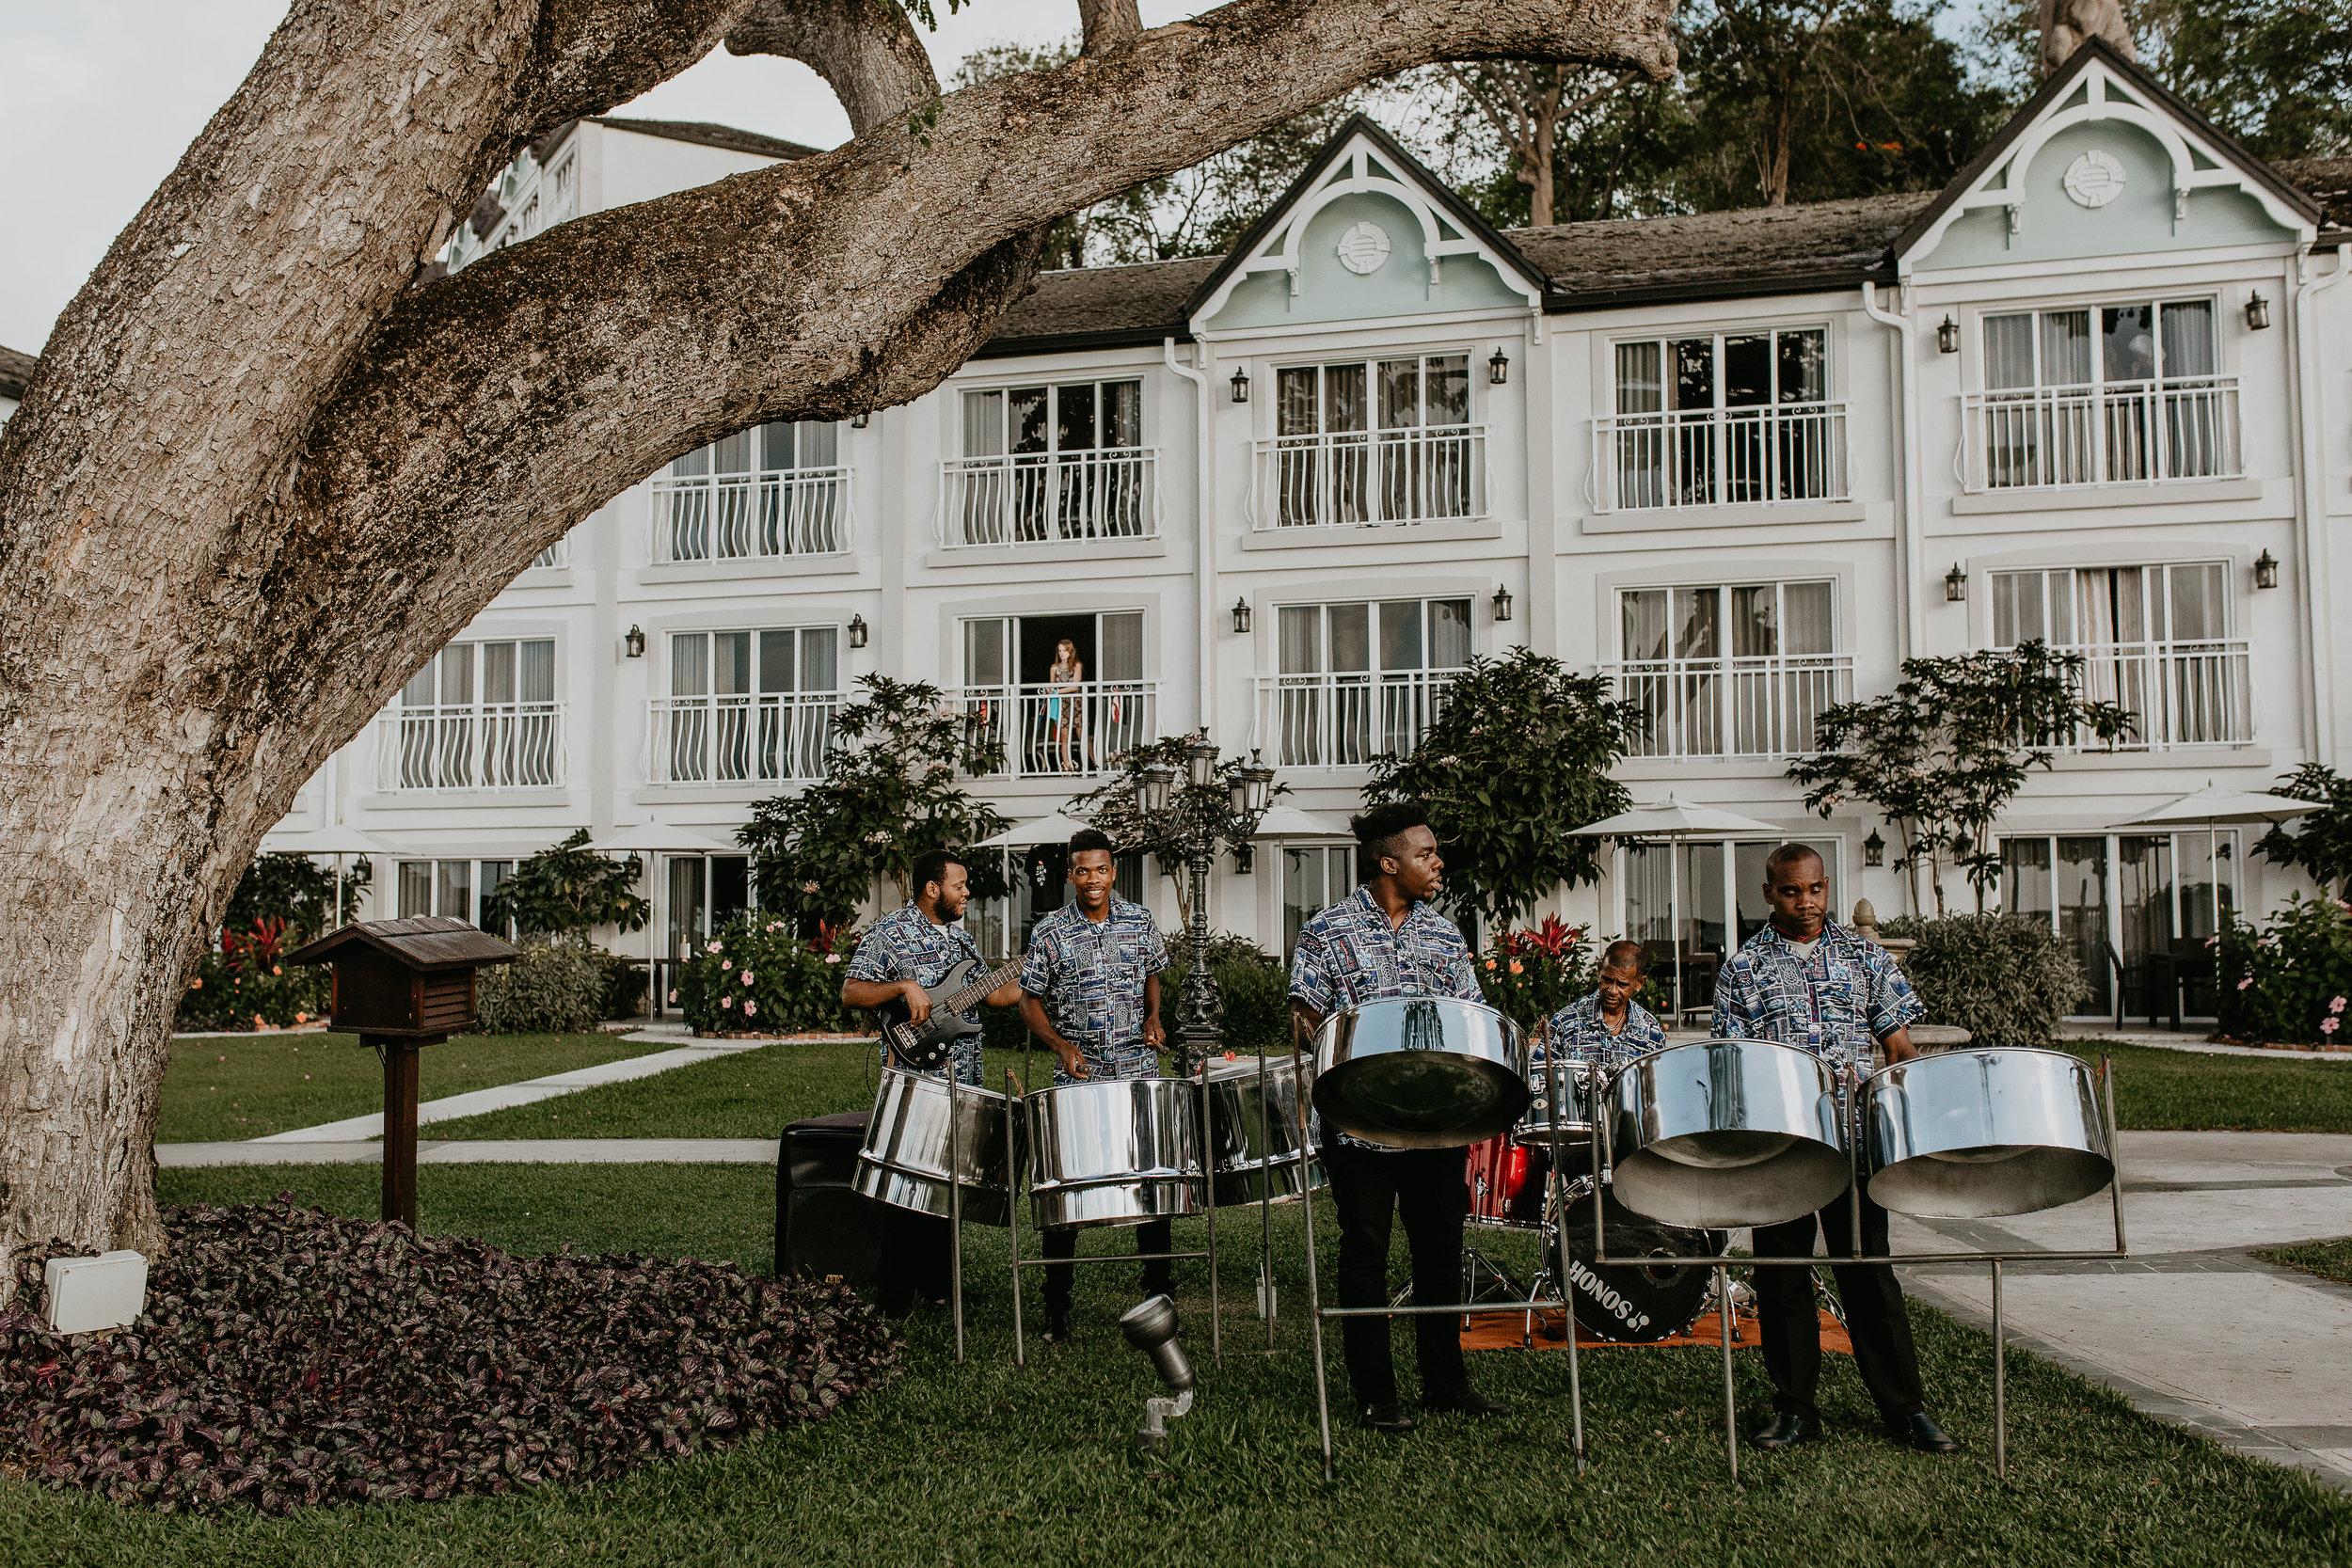 nicole-daacke-photography-destination-wedding-in-st-lucia-sandals-la-toc-intimate-island-wedding-carribean-elopement-photographer-chill-island-wedding-102.jpg